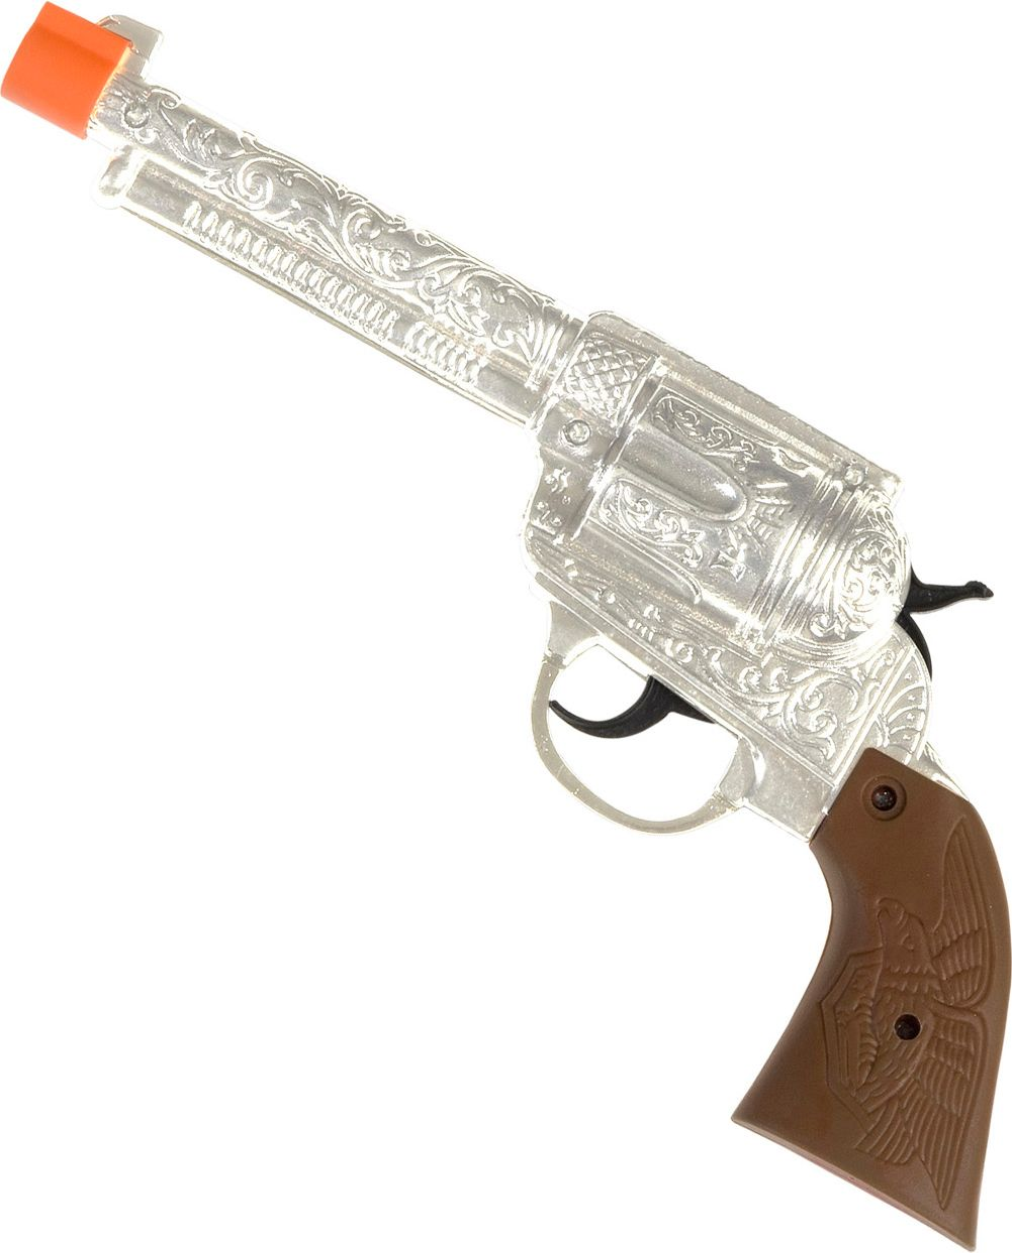 Zilveren cowboy revolver